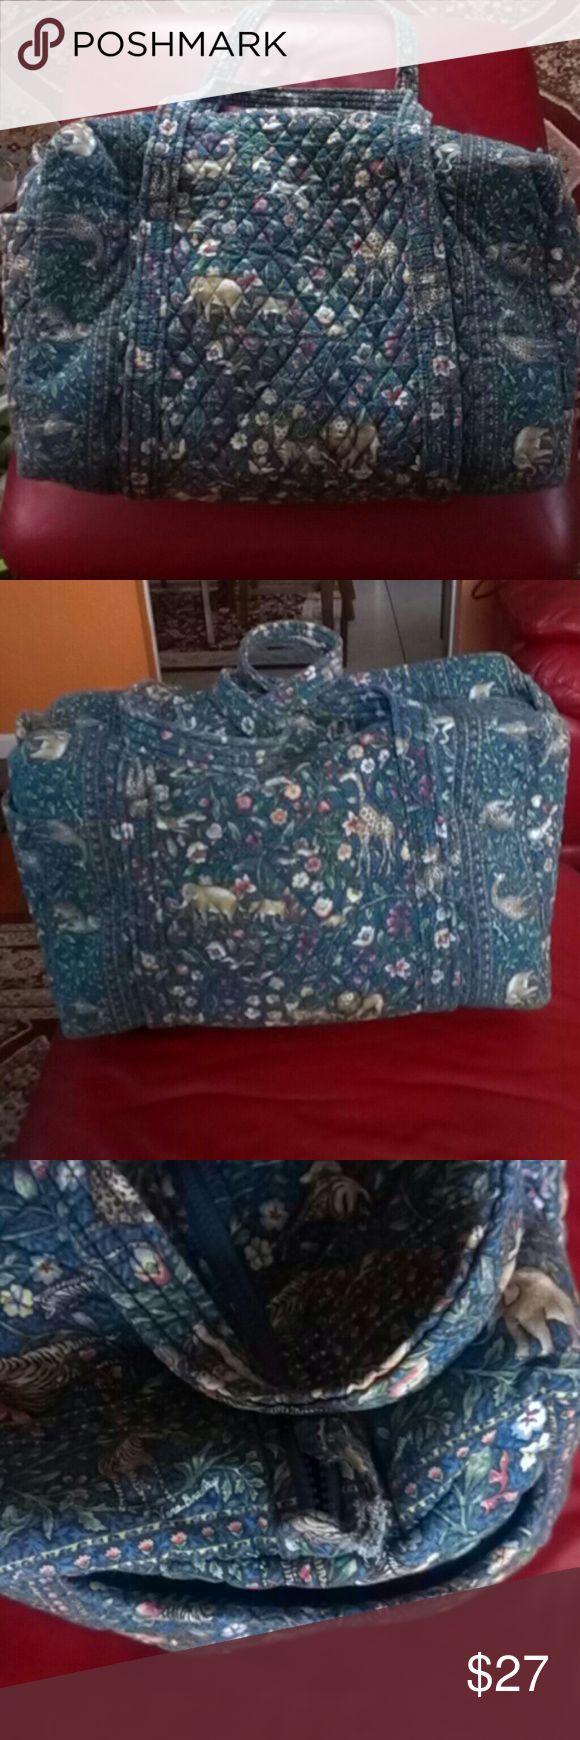 Travel bag vera bradley